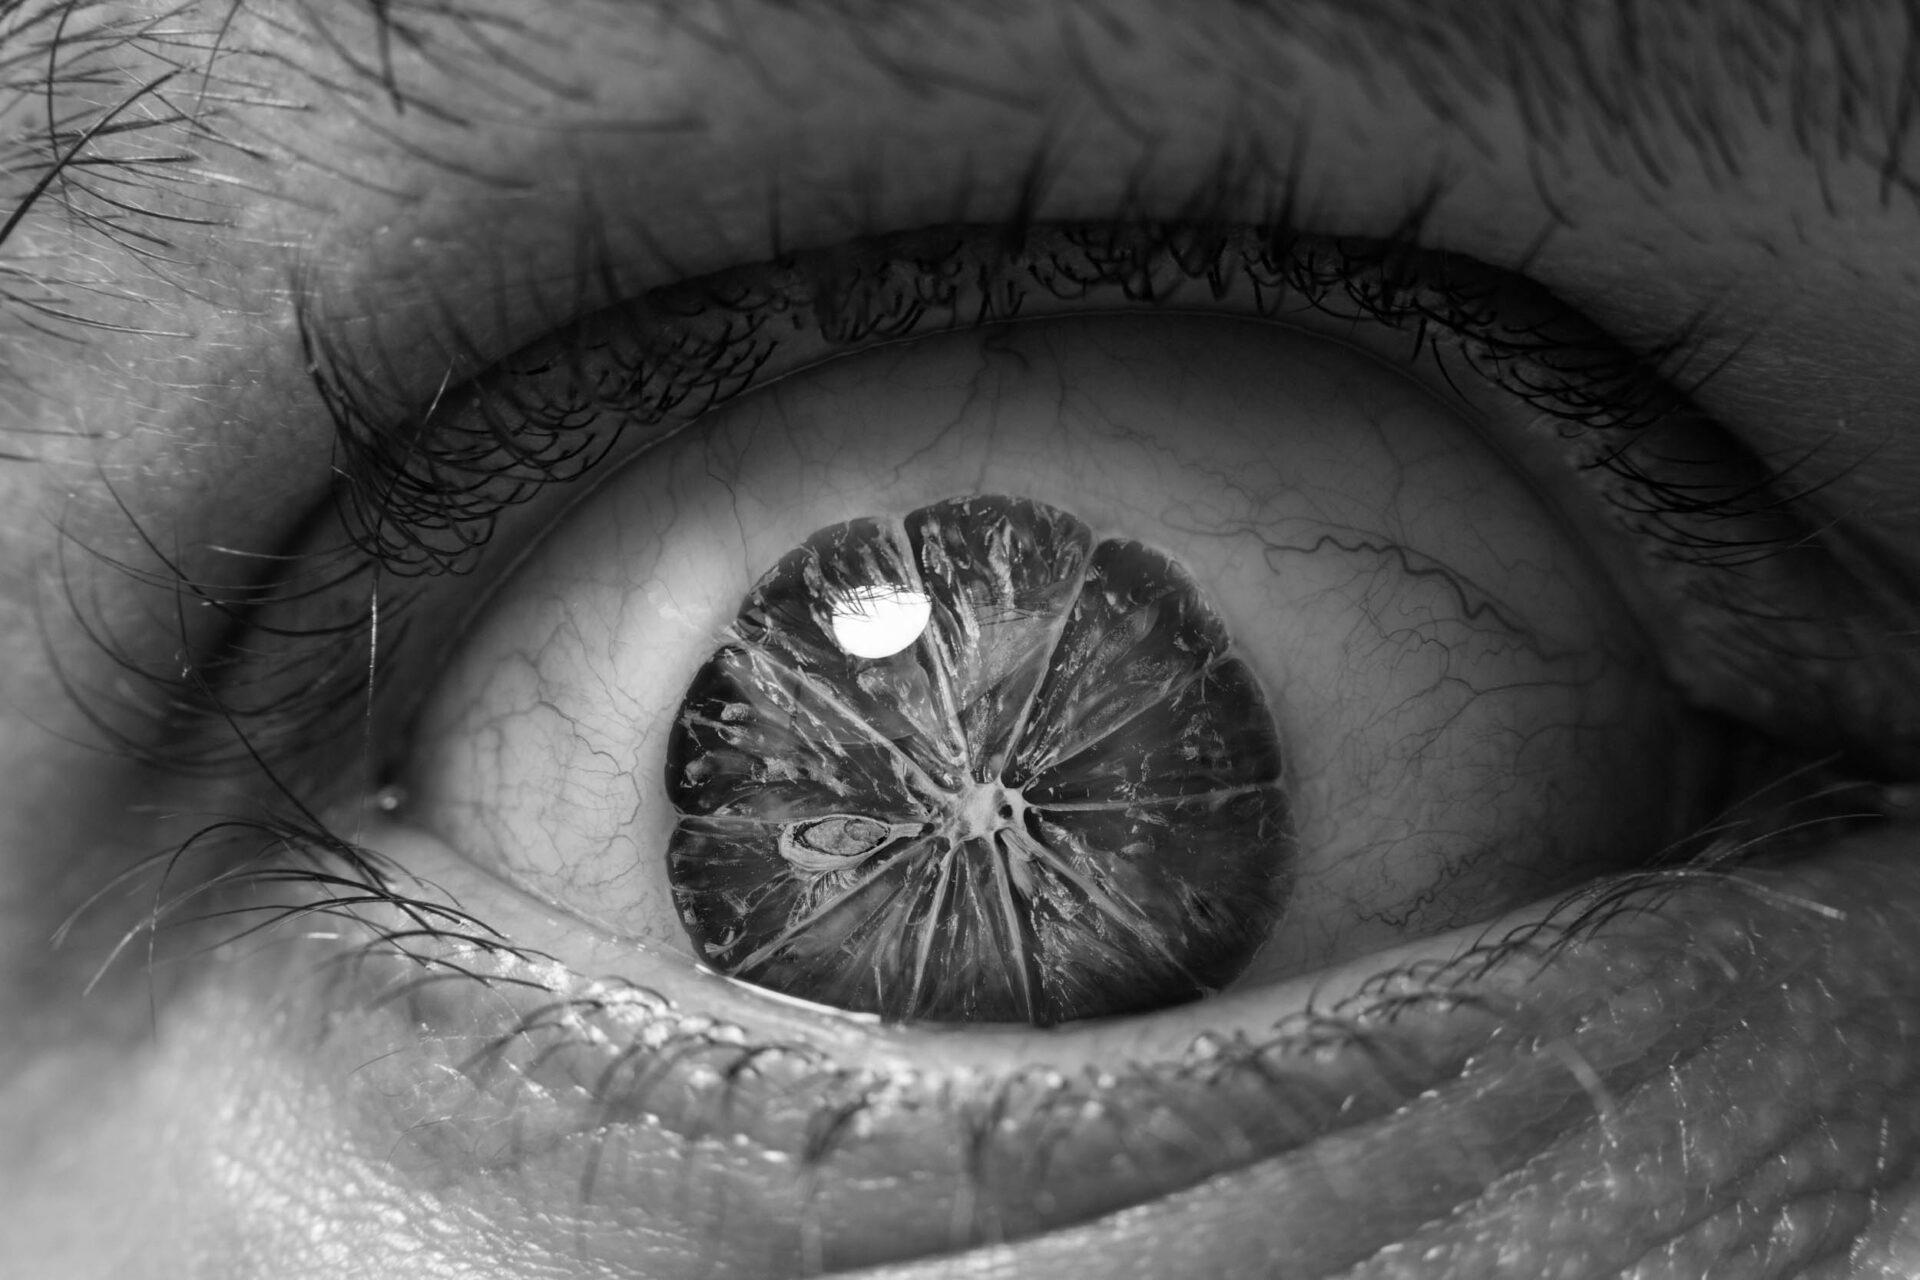 L'eye'mon II